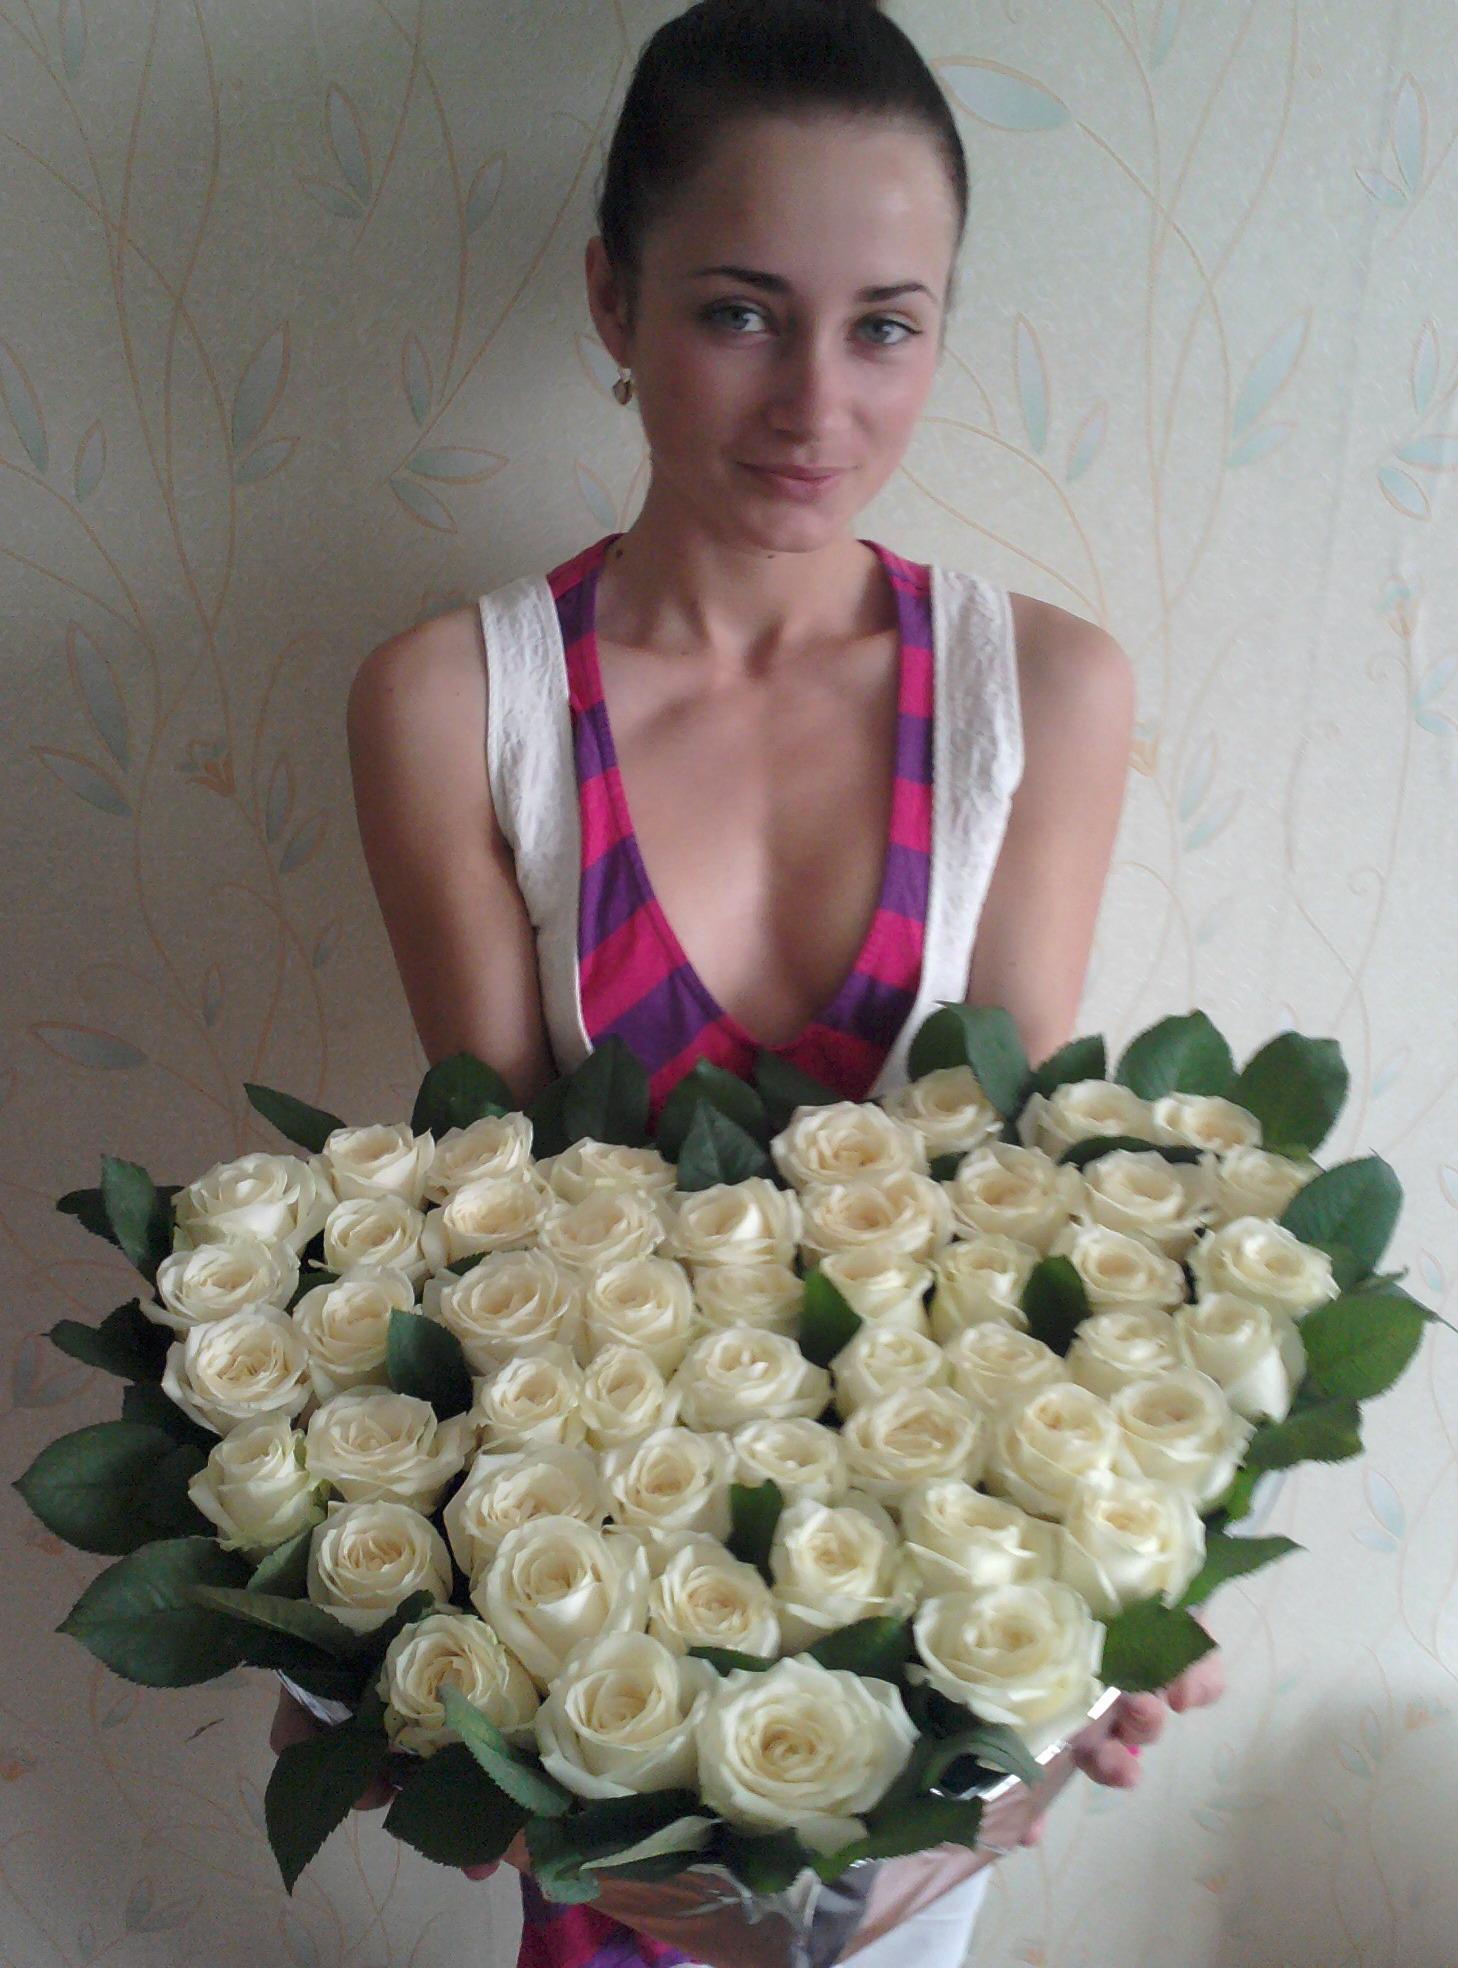 Доставка цветов и букетов в Минске, интернет-магазин